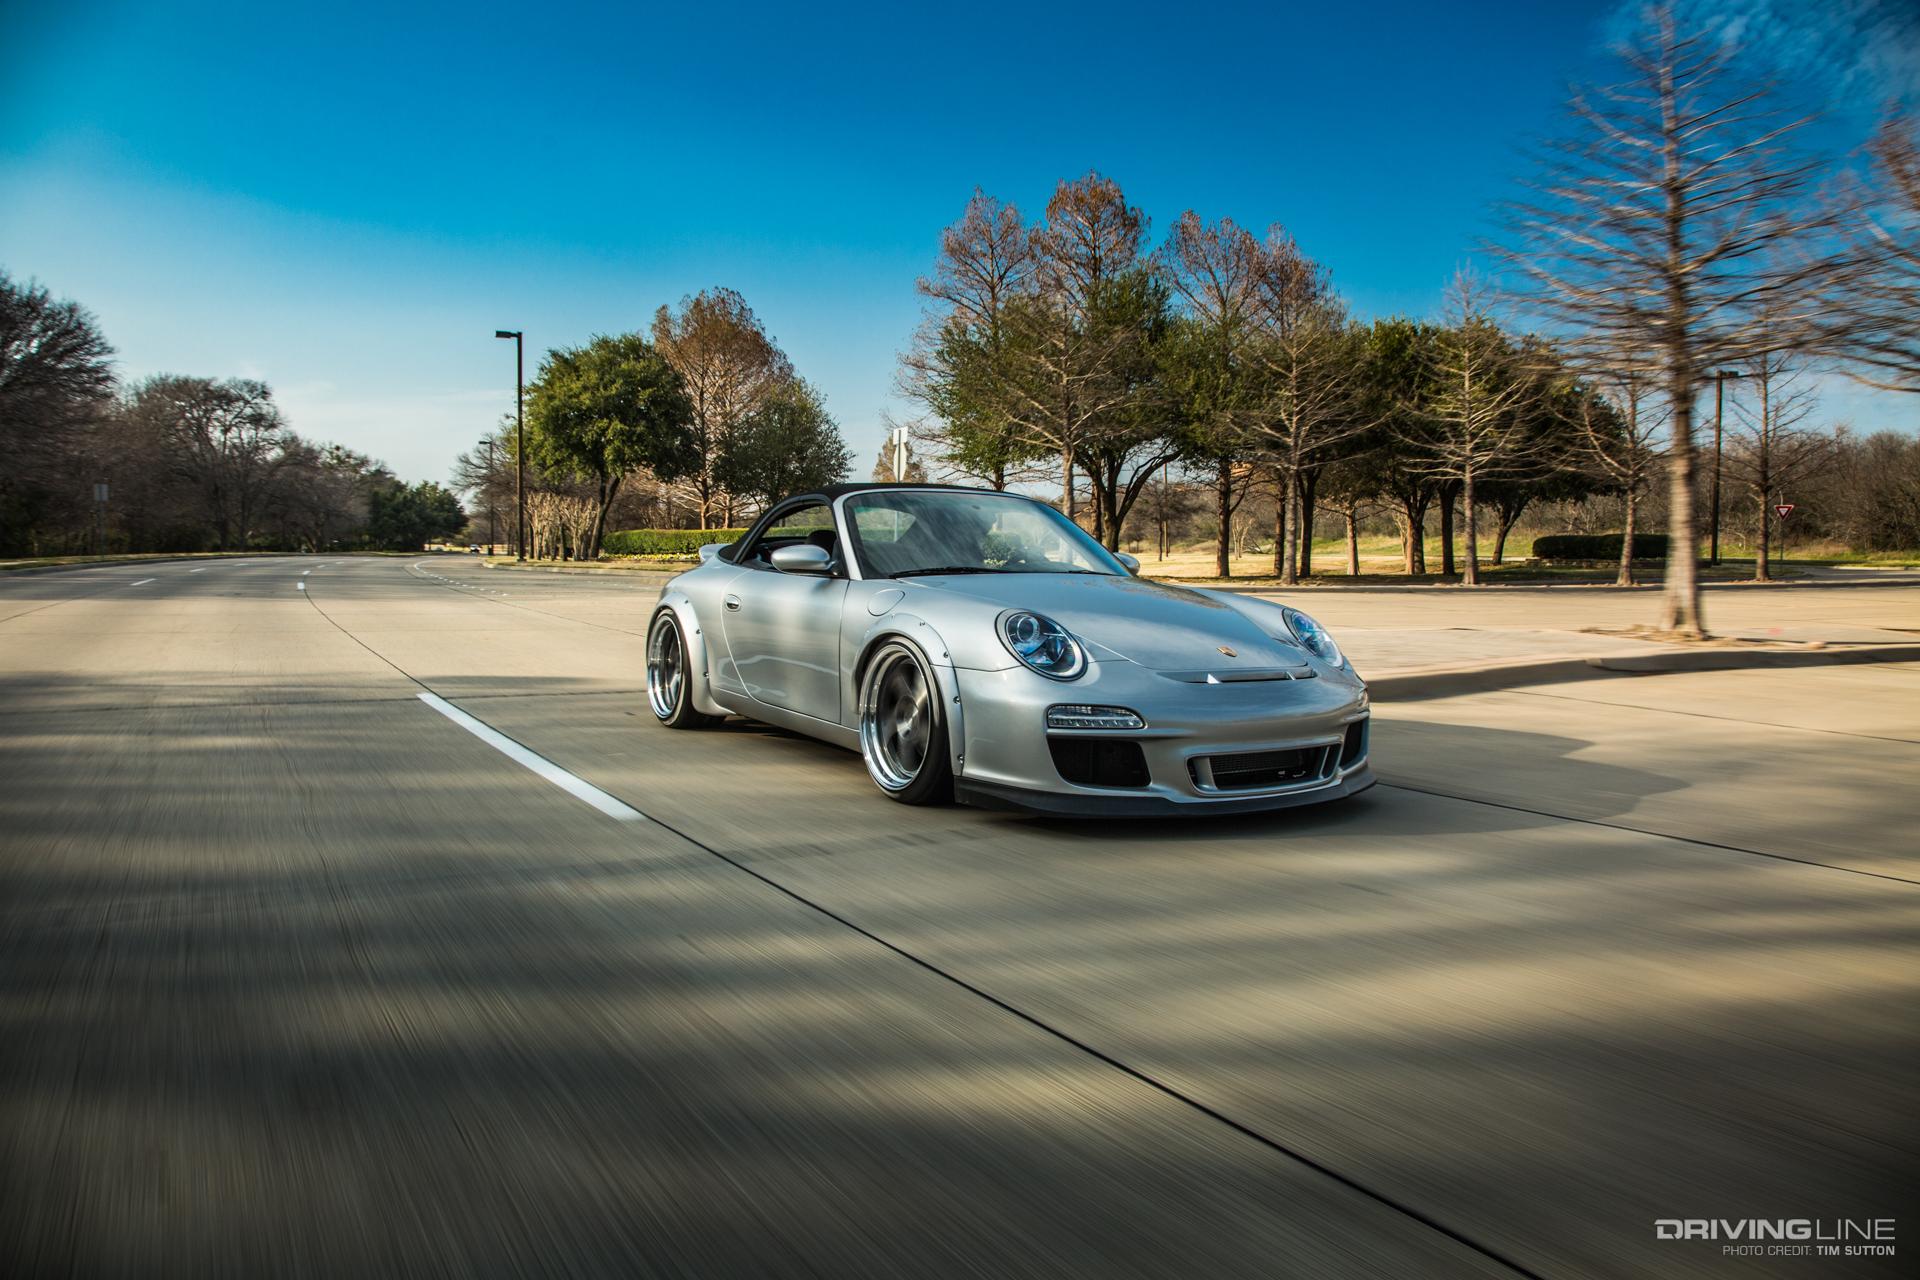 Gas Monkey Garage's LS Swapped Porsche 996: Not Just a